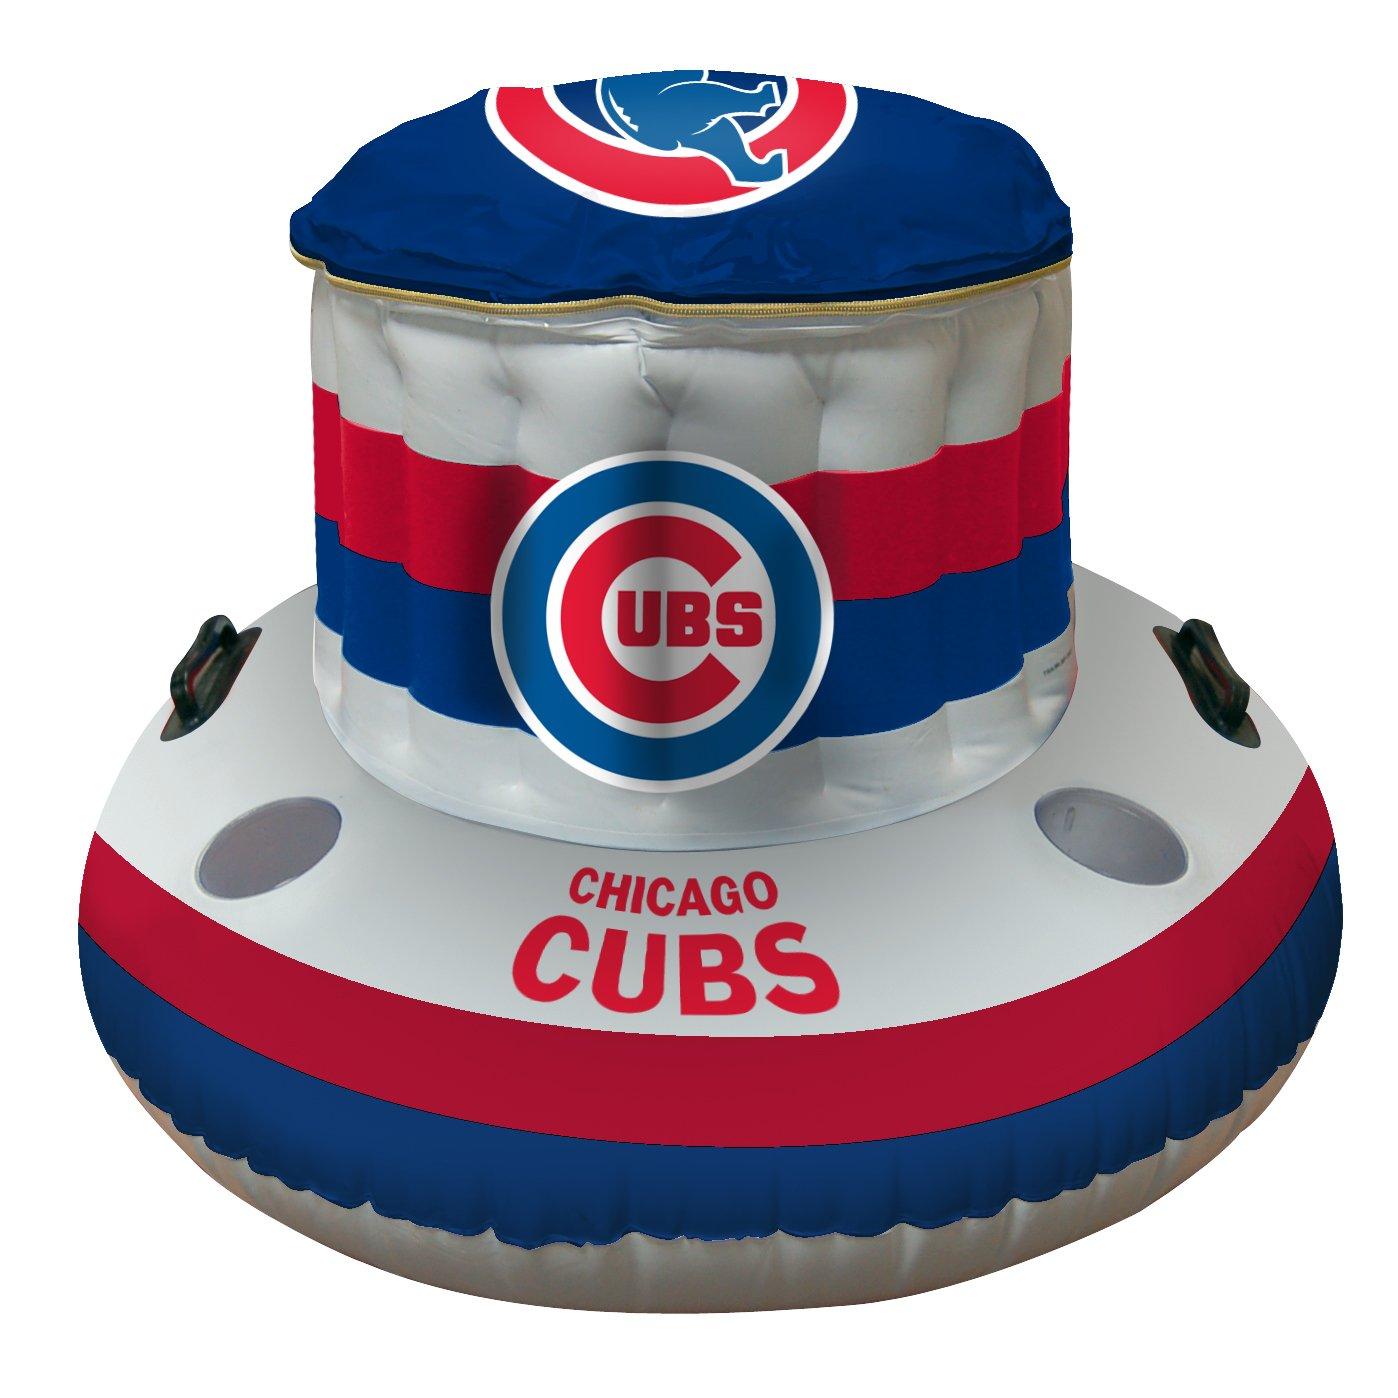 MLB Inflatable Cooler MLB Team: Chicago Cubs цена и фото